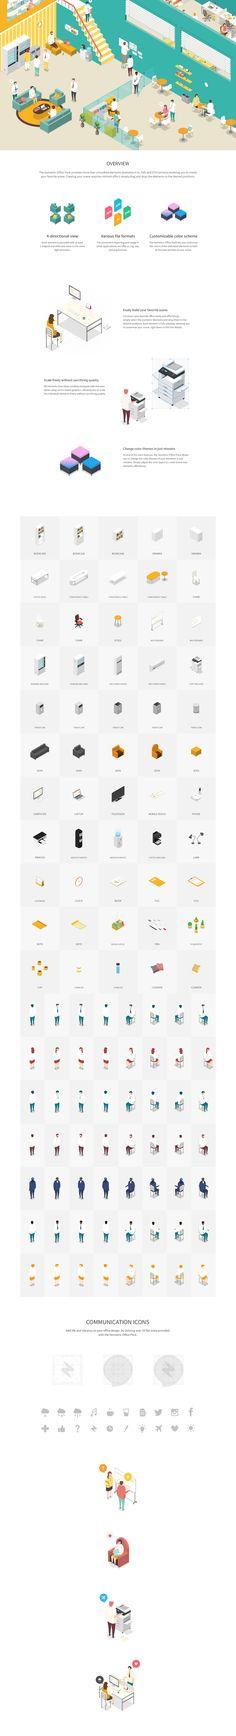 Infographic Design Showcase and discover creative work on the world's leading online platform f Web Design, Icon Design, Graphic Design, Isometric Drawing, Isometric Design, Flat Illustration, Digital Illustration, 8bit Art, Photoshop